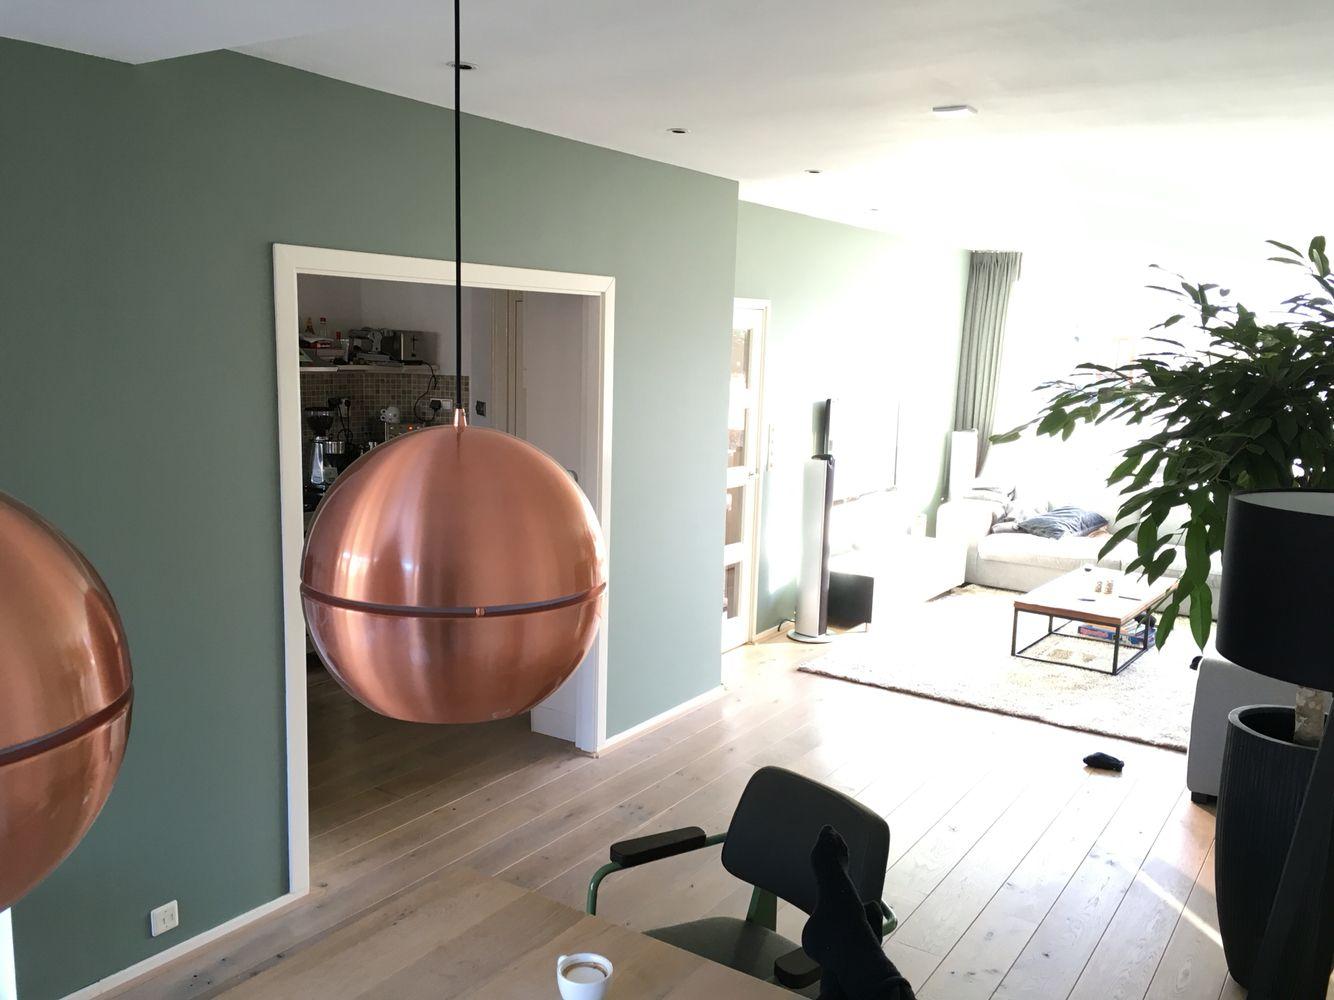 Farrow & Ball card room green no.79 like | My home | Pinterest ...